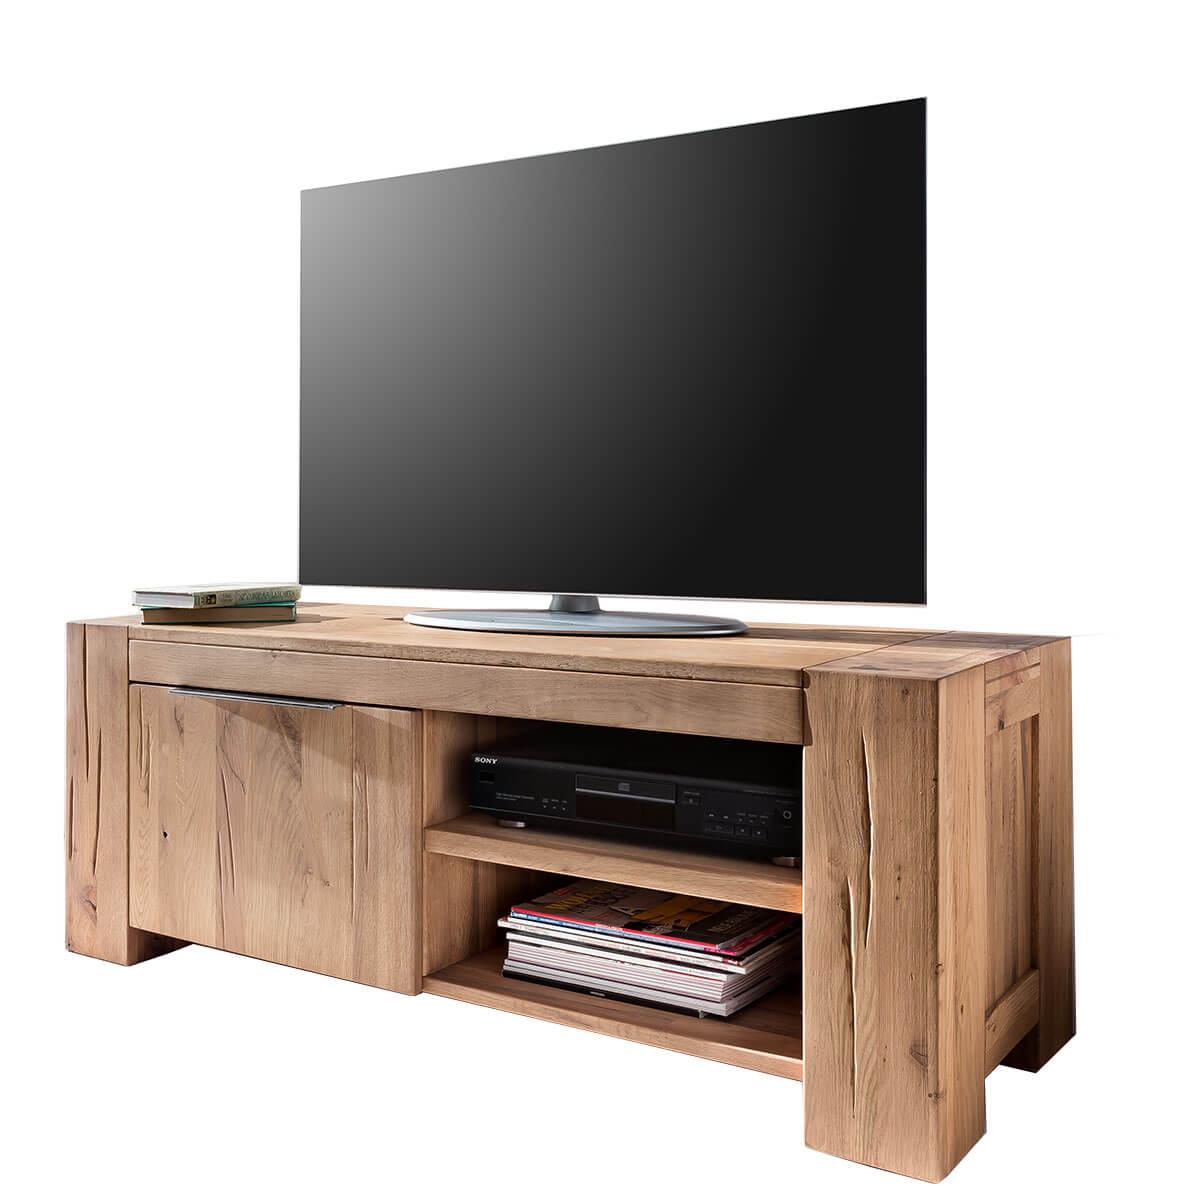 Attractive TV Lowboard Granby In Eiche Natur Geölt 130 Cm U2013 Bild 1 Nice Look